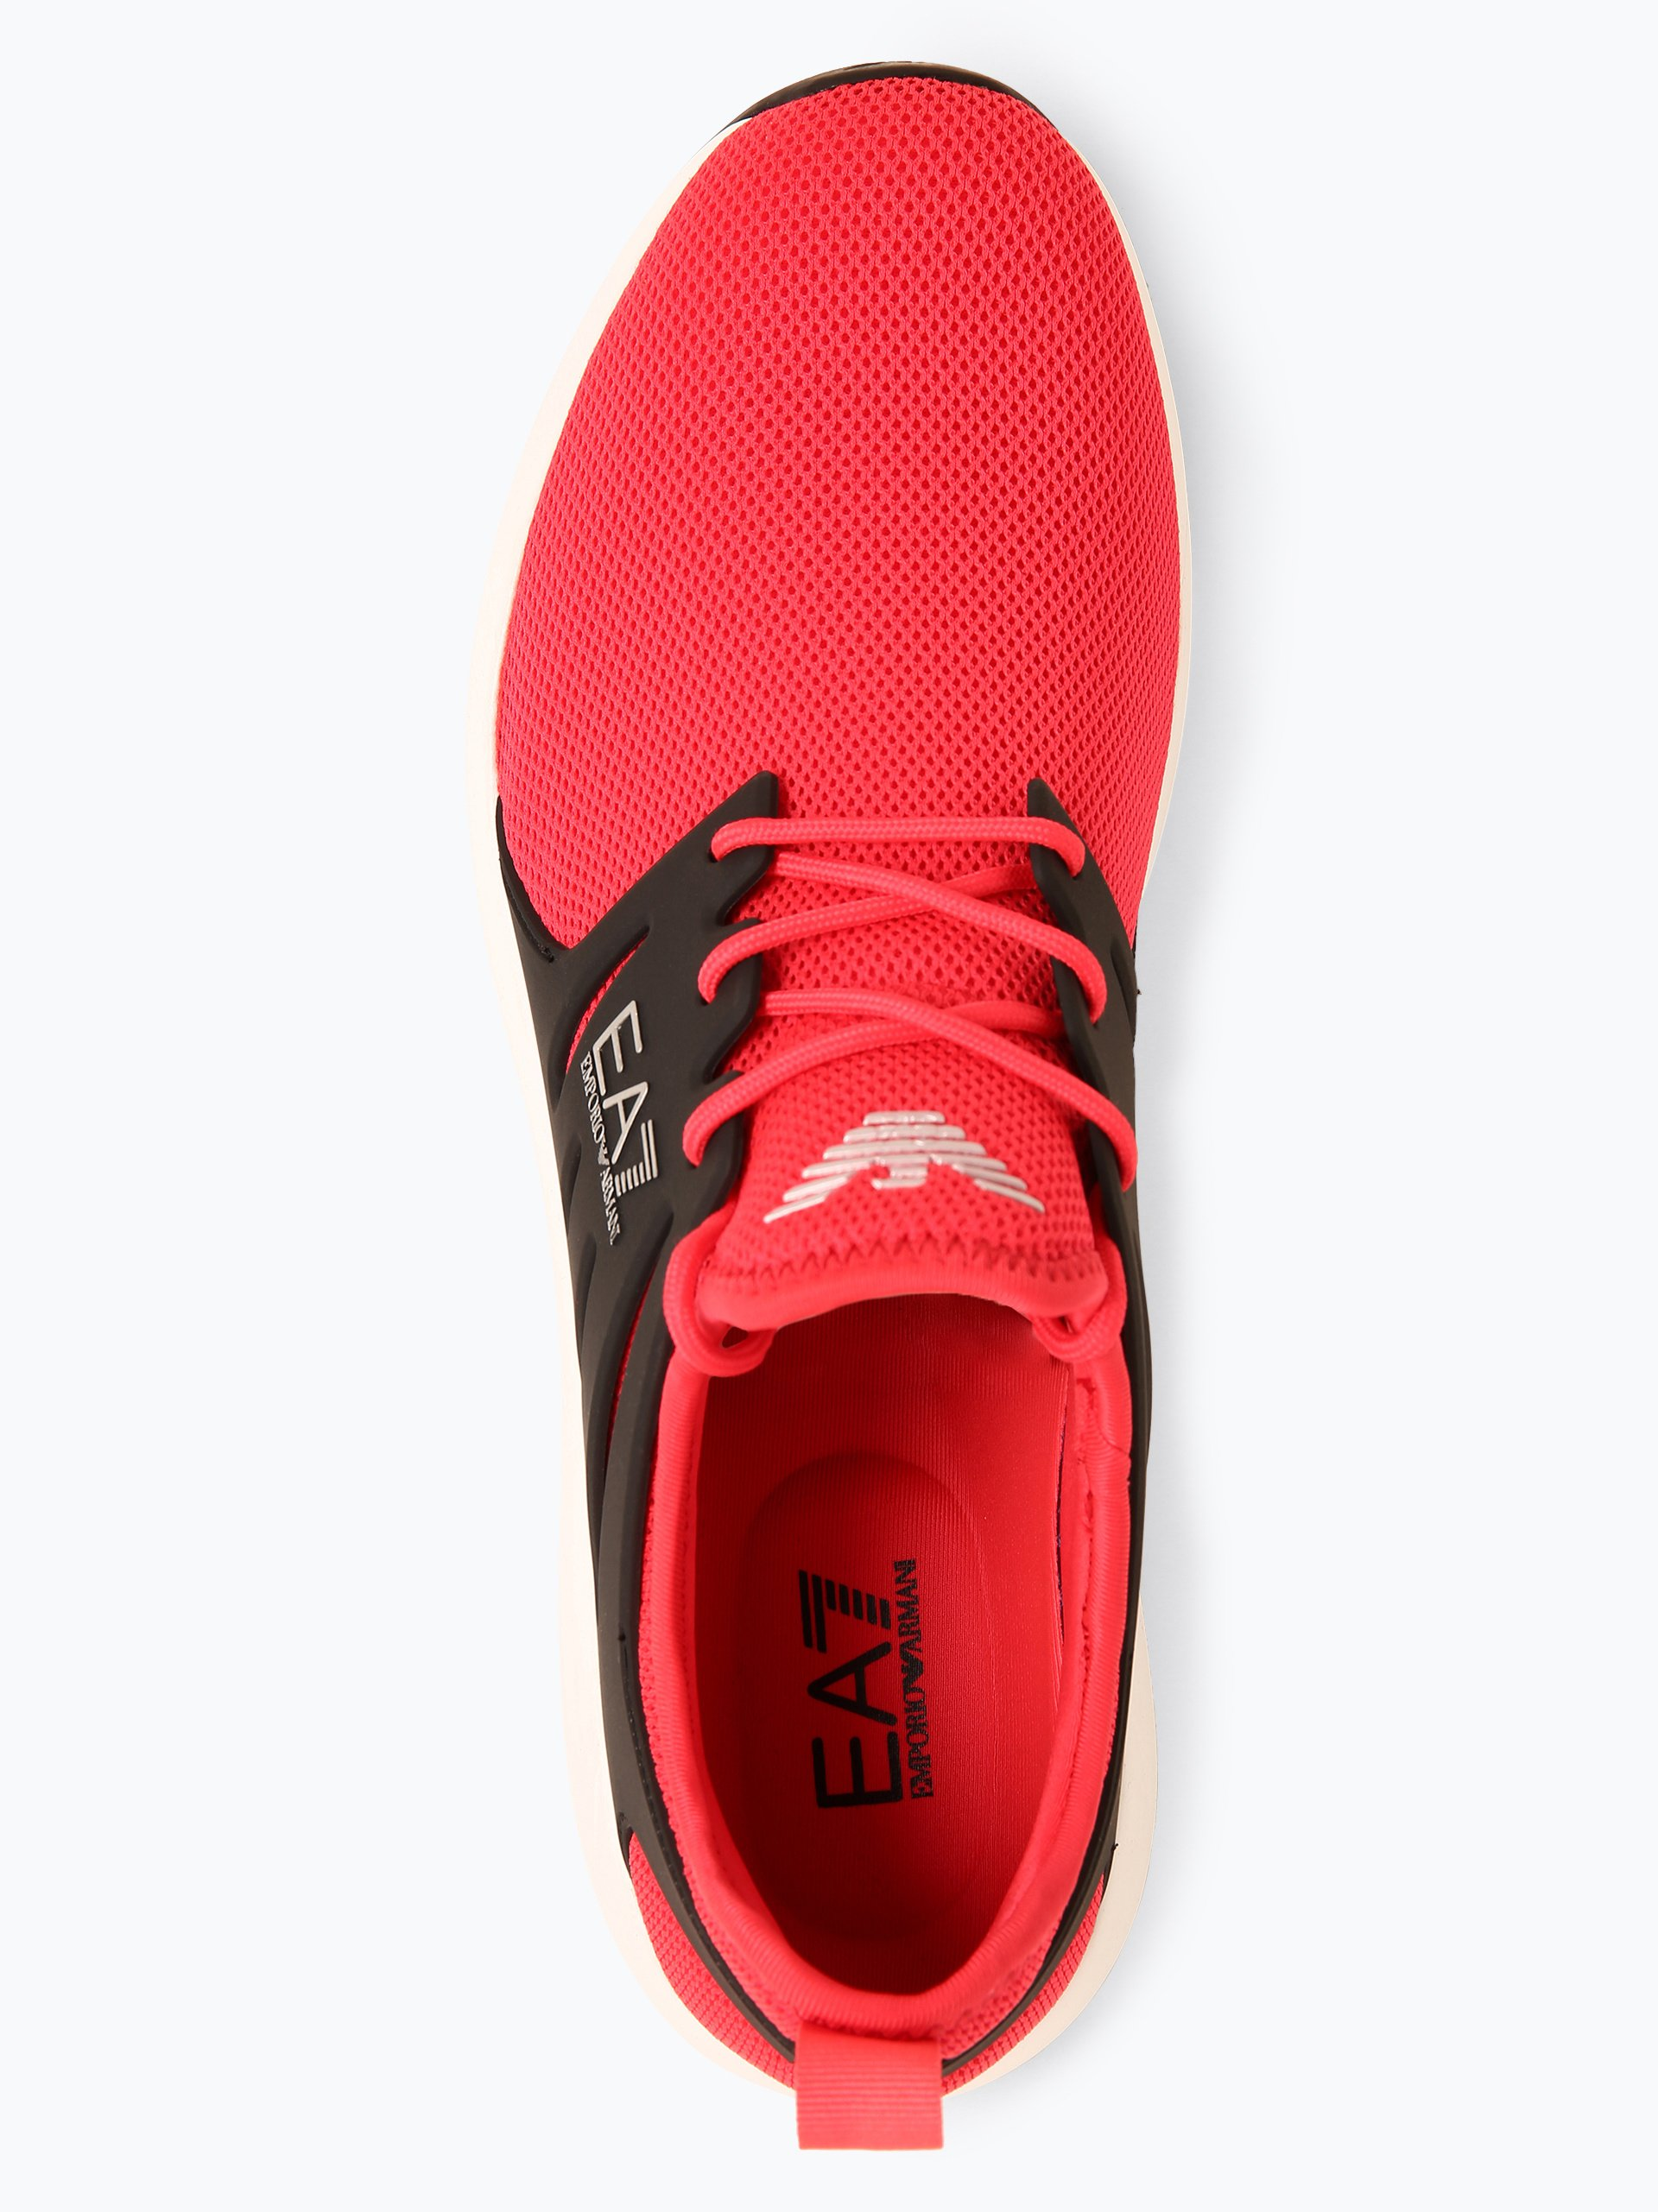 EA7 Emporio Armani Tenisówki męskie